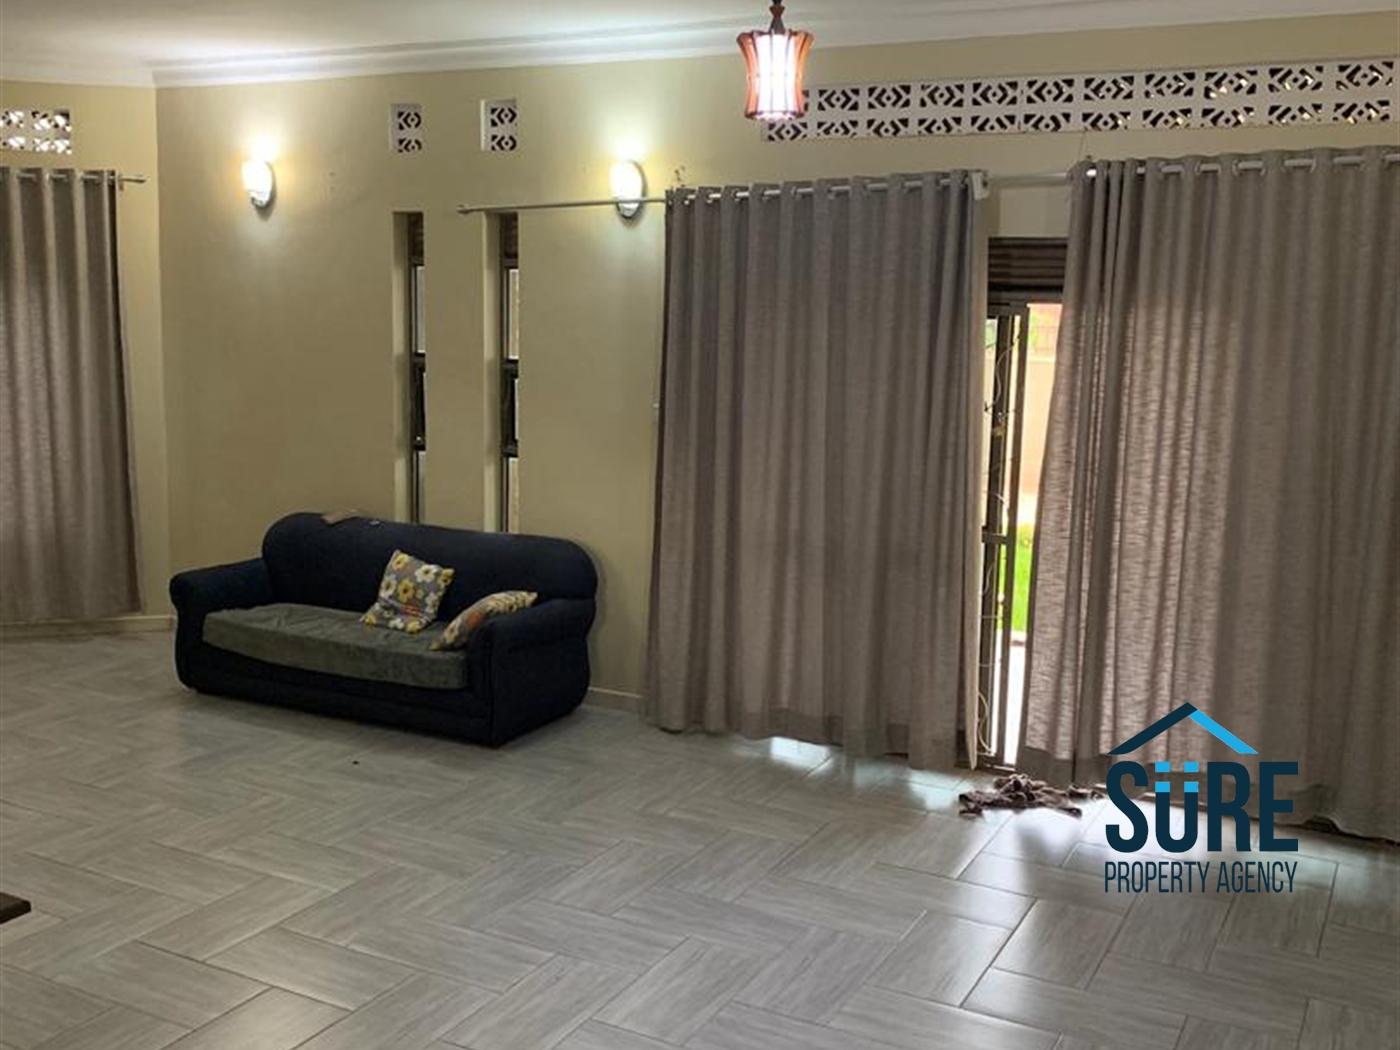 Bungalow for rent in Gayaza Wakiso